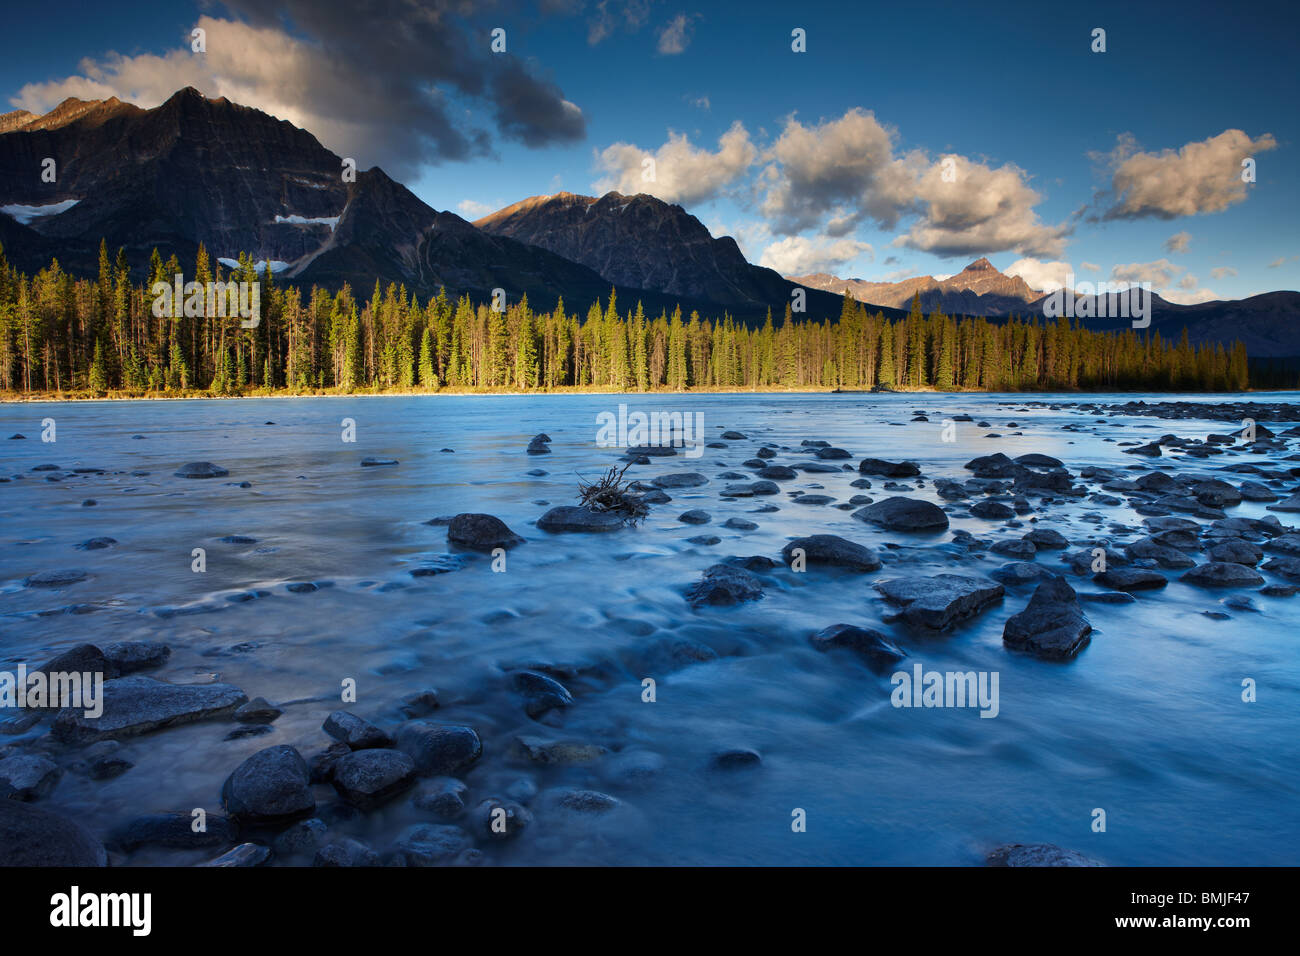 the Athabasca River with Mt Fryatt & Mt Edith Cavell, Jasper National Park, Alberta, Canada - Stock Image